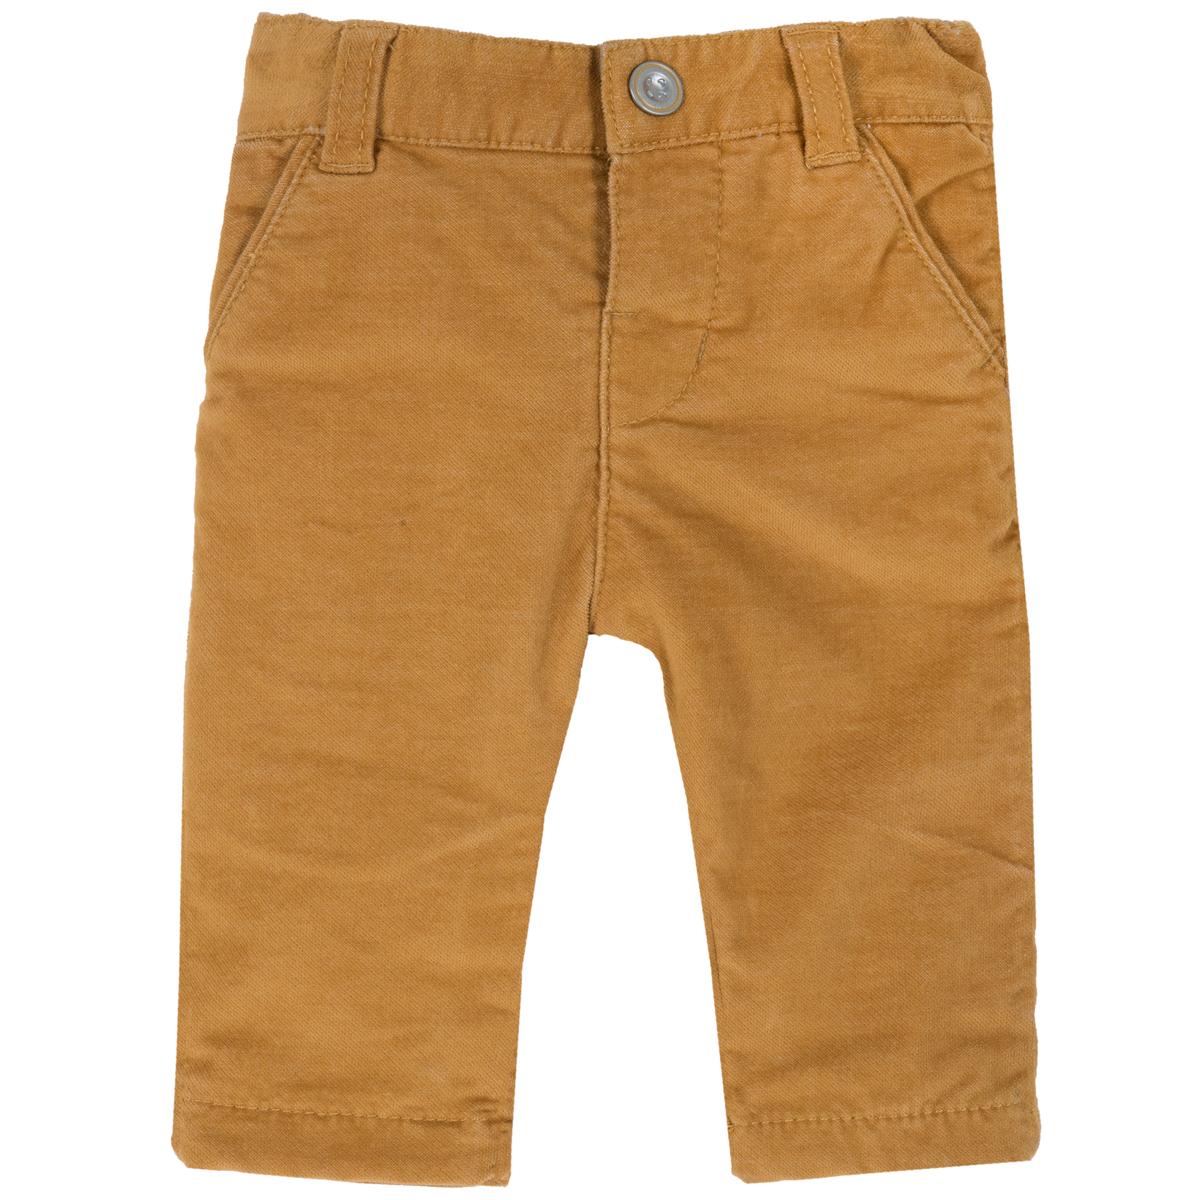 Pantaloni lungi copii Chicco, catifea stretch, galben, 94735 din categoria Pantaloni copii